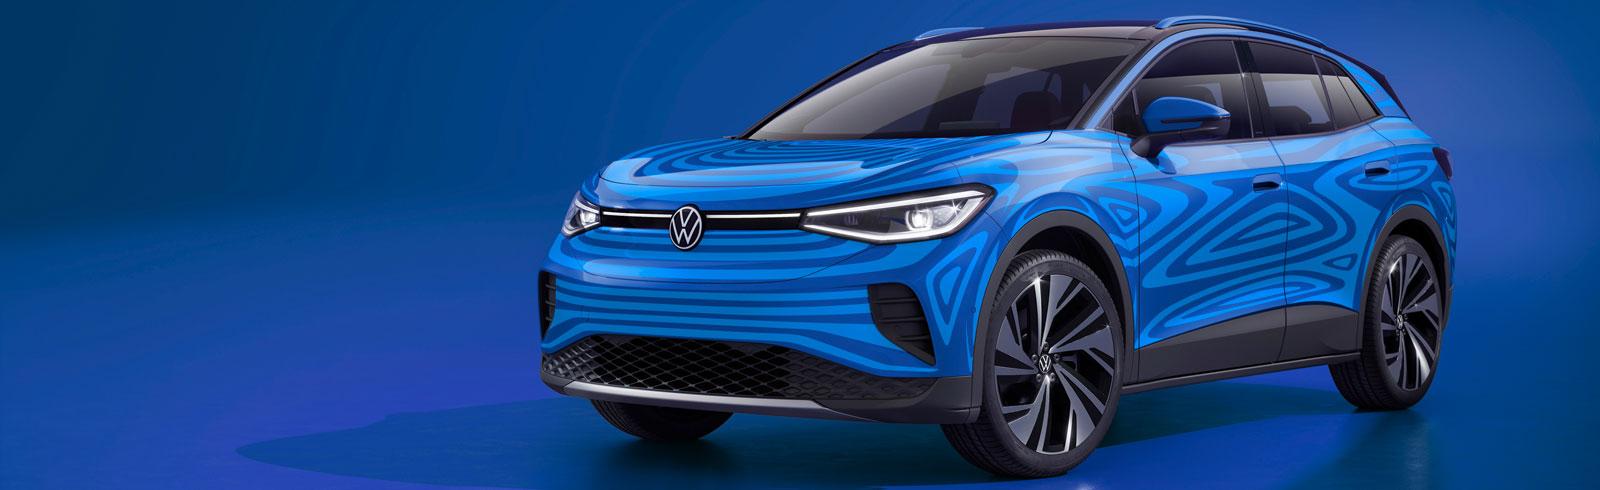 Volkswagen elaborates on the ID.4 (ID.CROZZ)